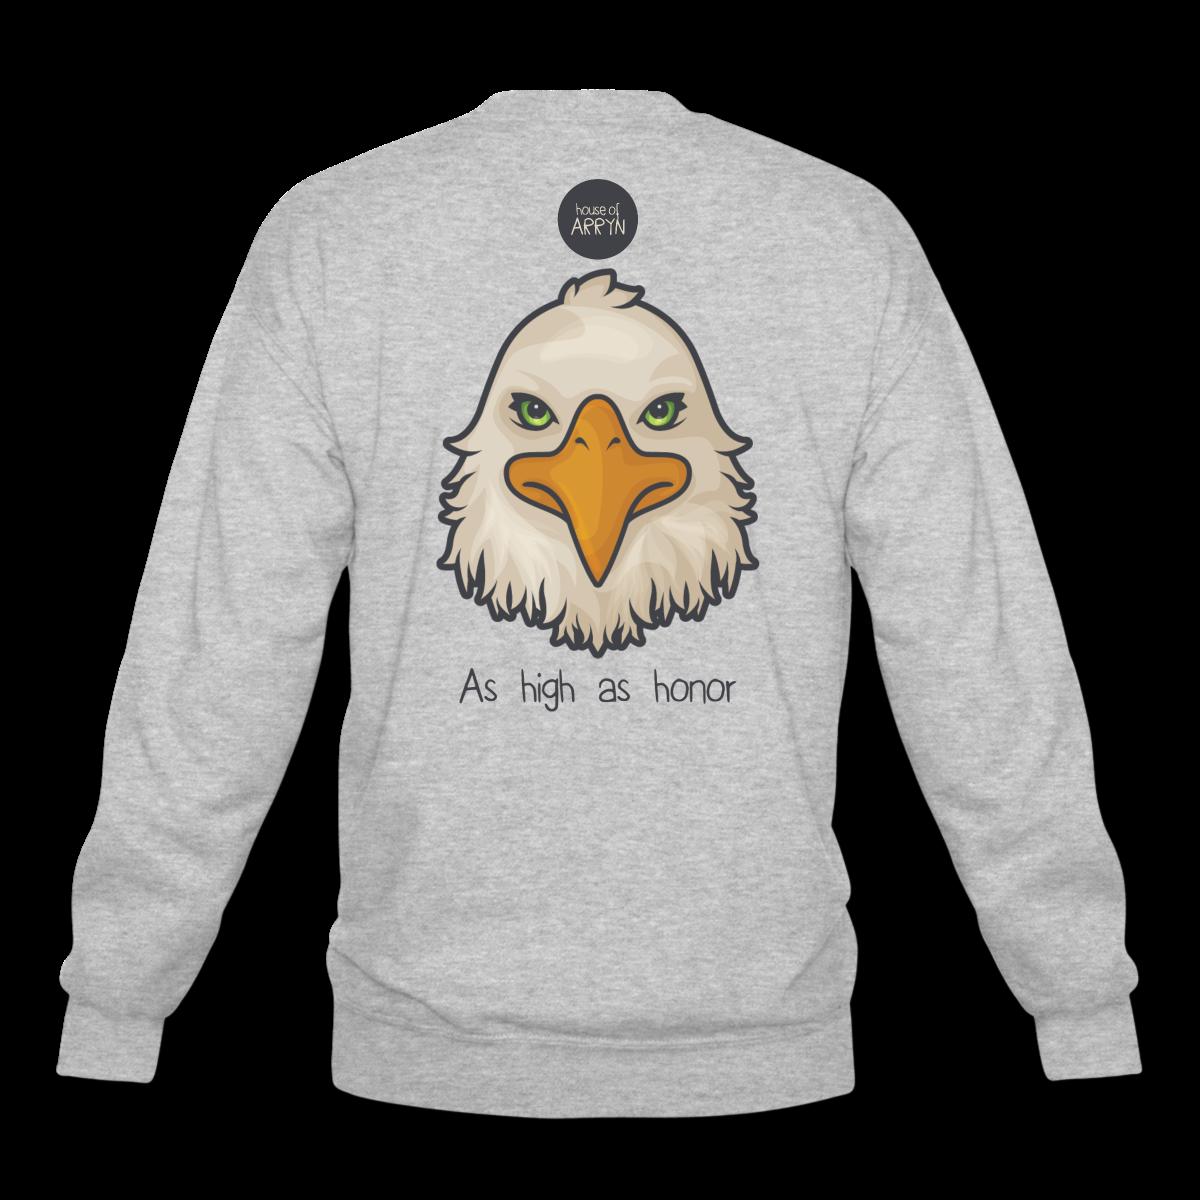 Got As High As Honor 45 00 Men S Crewneck Sweatshirt Lightweight Crewneck Sweatshirt For Men 50 Sweatshirts Mens Crewneck Sweatshirt Crew Neck Sweatshirt [ 1200 x 1200 Pixel ]